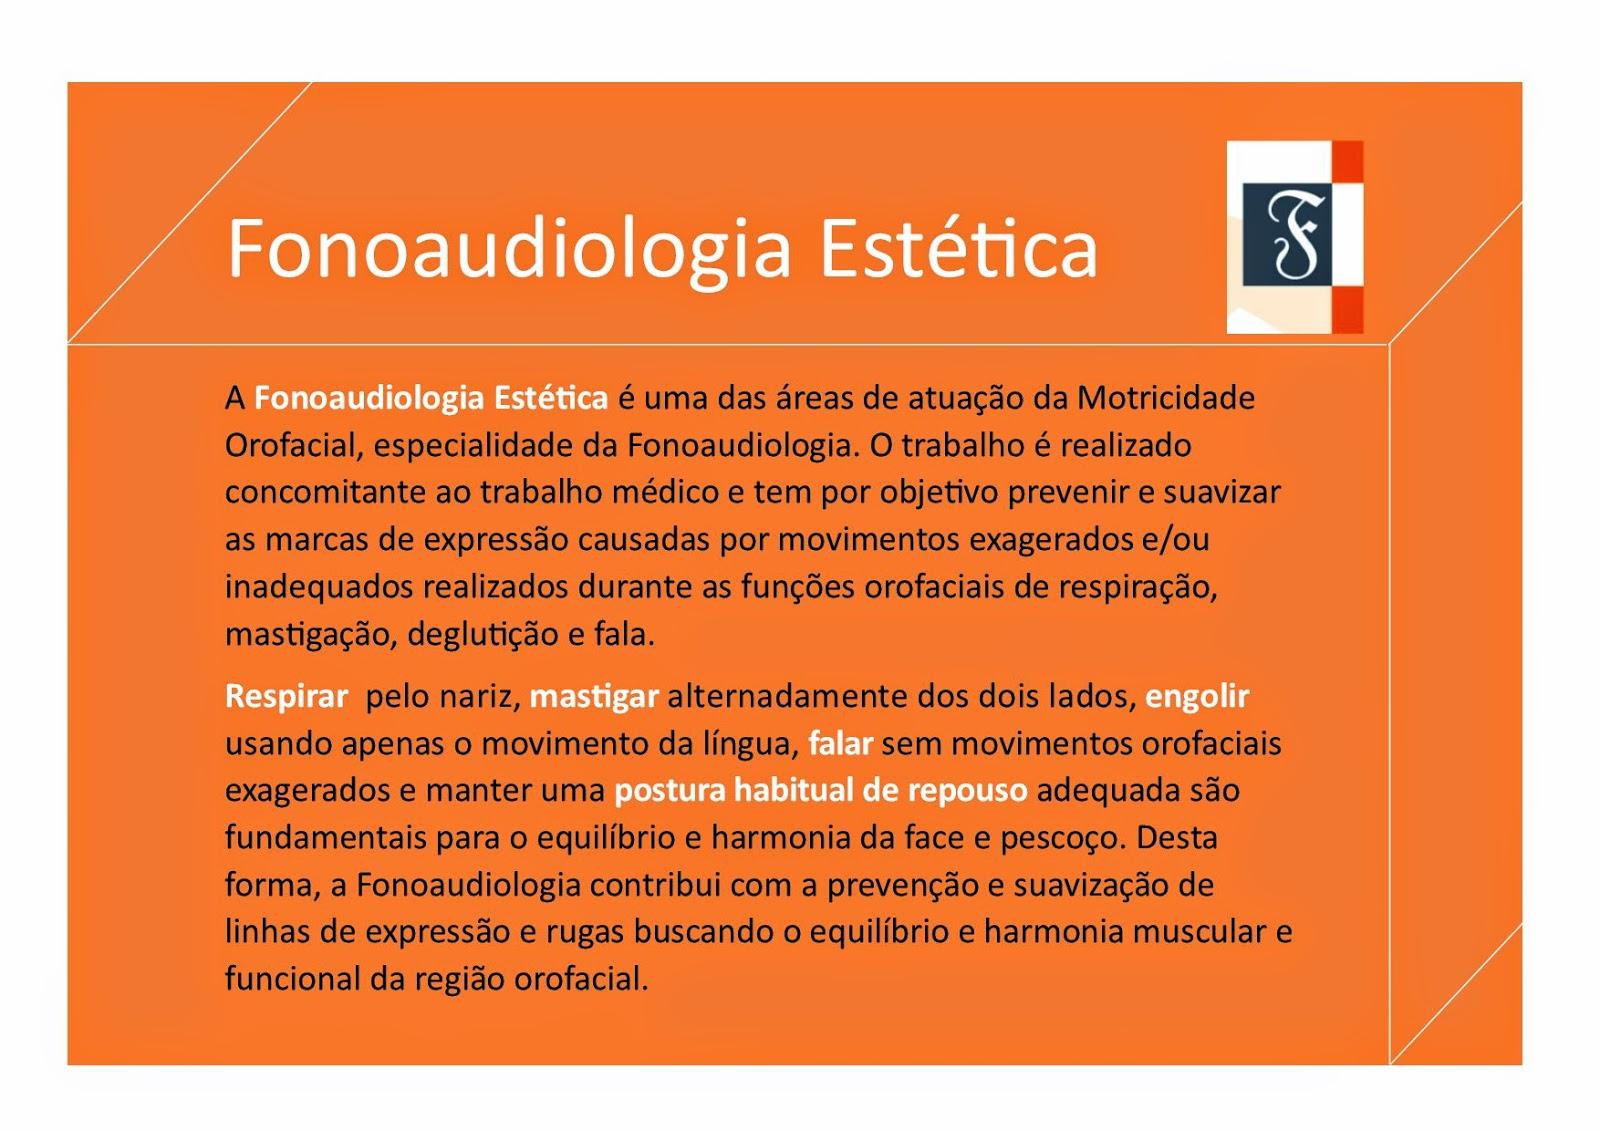 Est%C3%A9tica - FONOAUDIOLOGIA ESTÉTICA